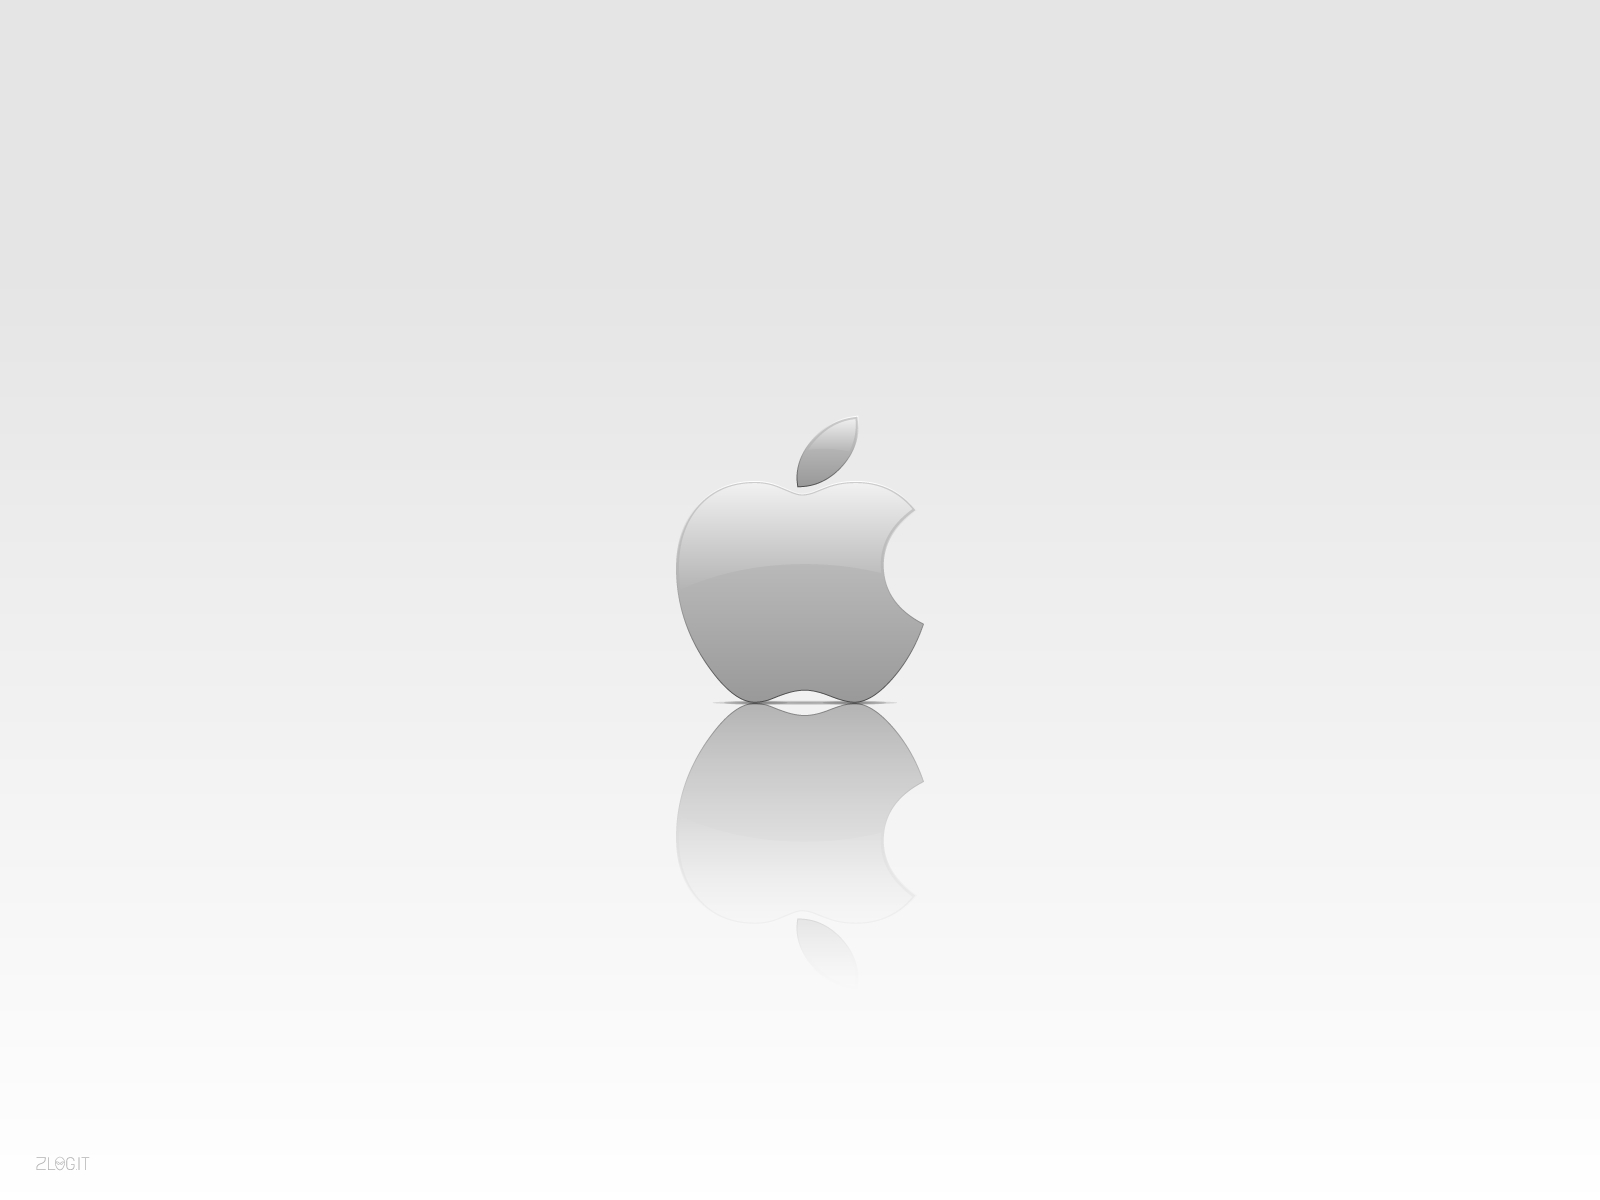 Why So Serious Wallpaper Iphone 6 Logo Amp Logo Wallpaper Collection 100 Top Apple Logos